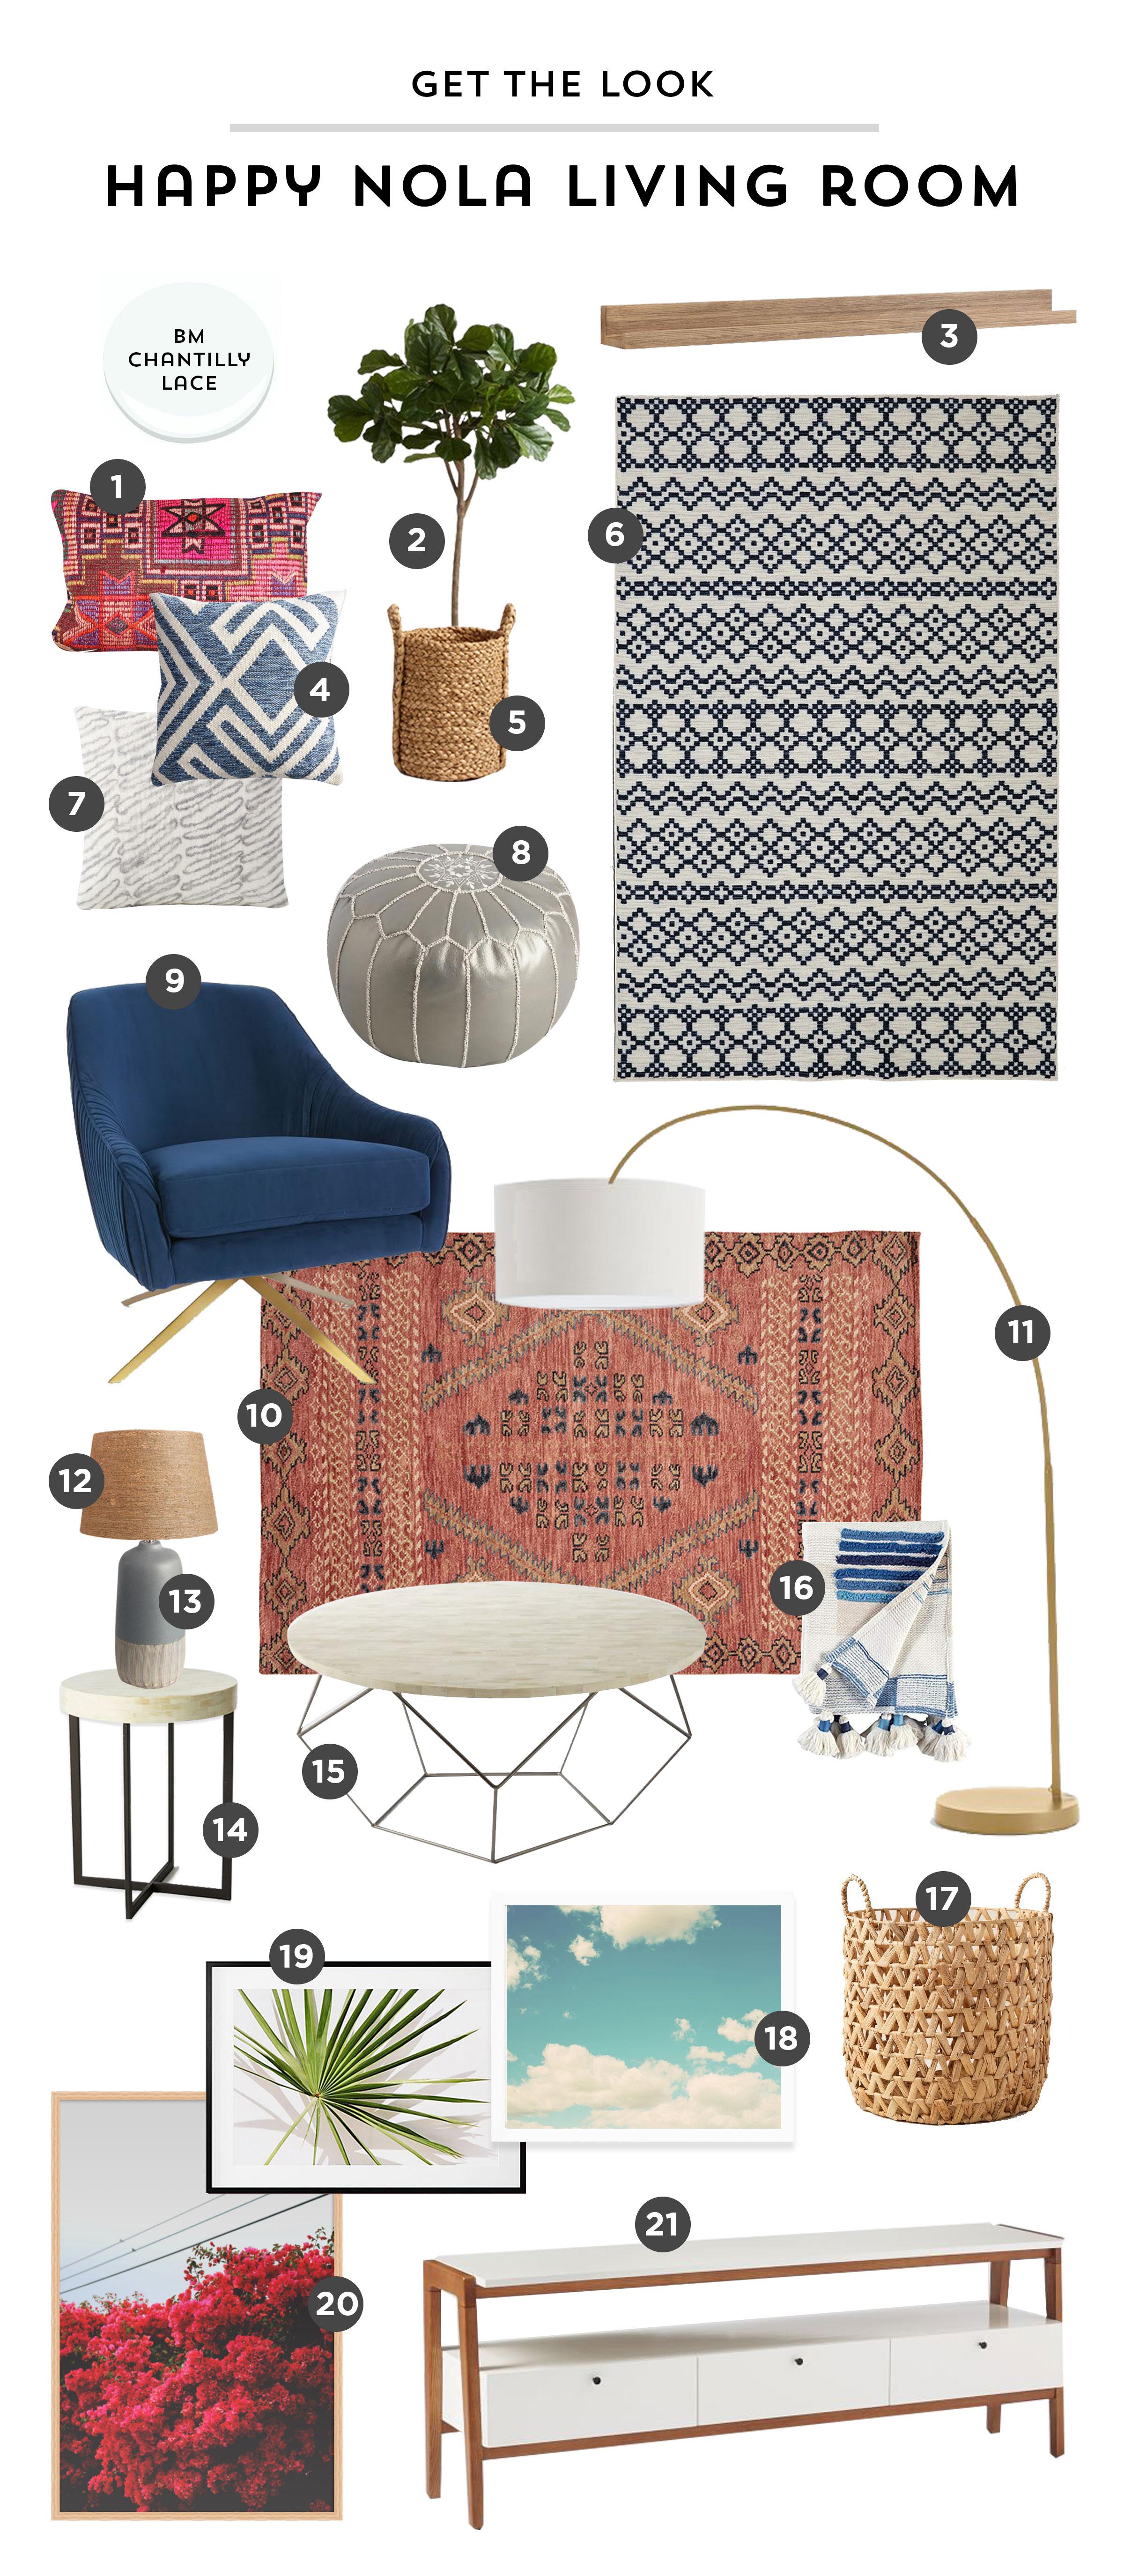 nola-living-room-get-the-look.jpg